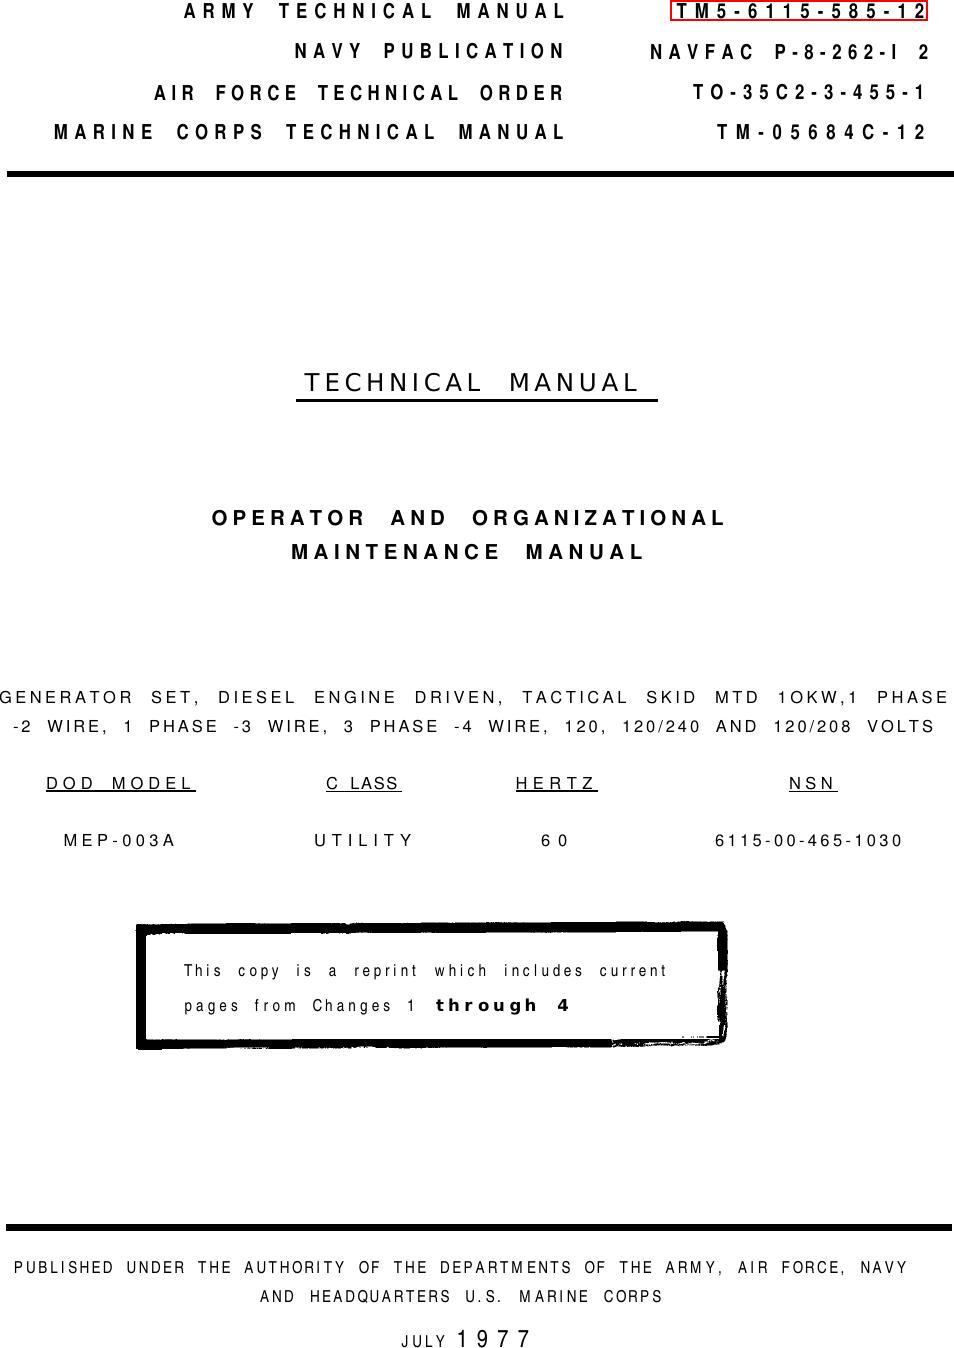 Tamf3b5tmp Tm 5 6115 585 12 Generator Set Diesel Engine Driven Rocker Switch Diagram 28emtd 30 Amp Toggle Tactical Skid Mtd 10 Kw 1 Phase 2 Wire 3 And 4 120 240 208 V Dod Mep